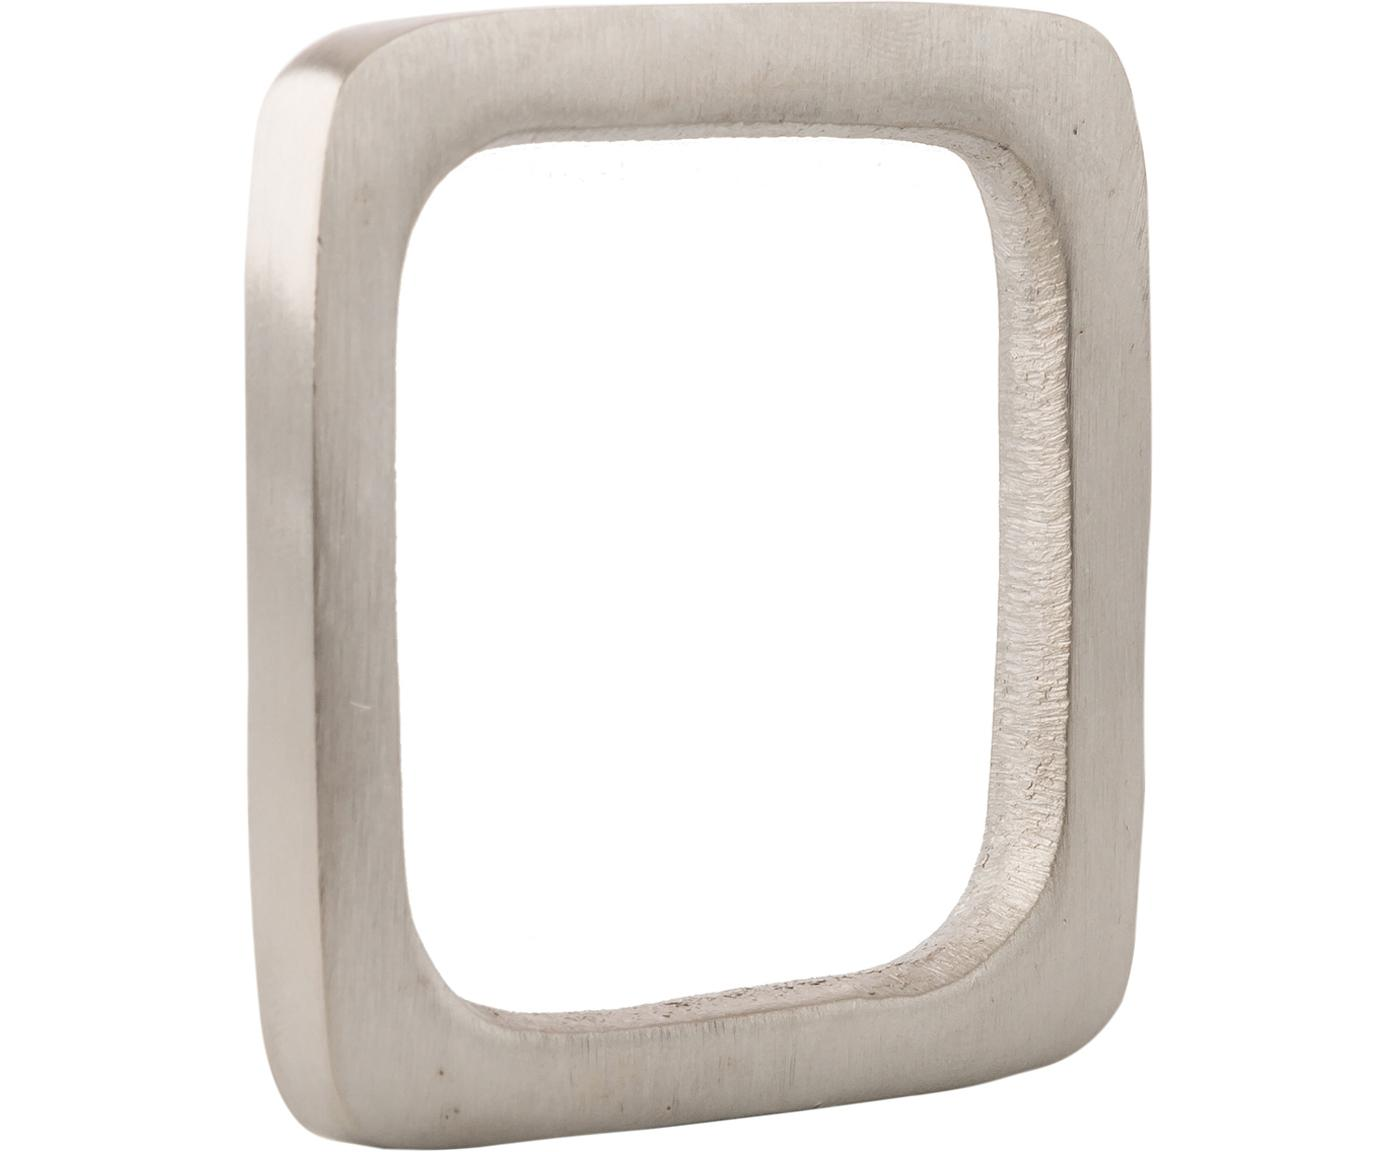 Obrączka na serwetkę Squark, 4 szt., Aluminium niklowane, Nikiel, S 5 x D 5 cm